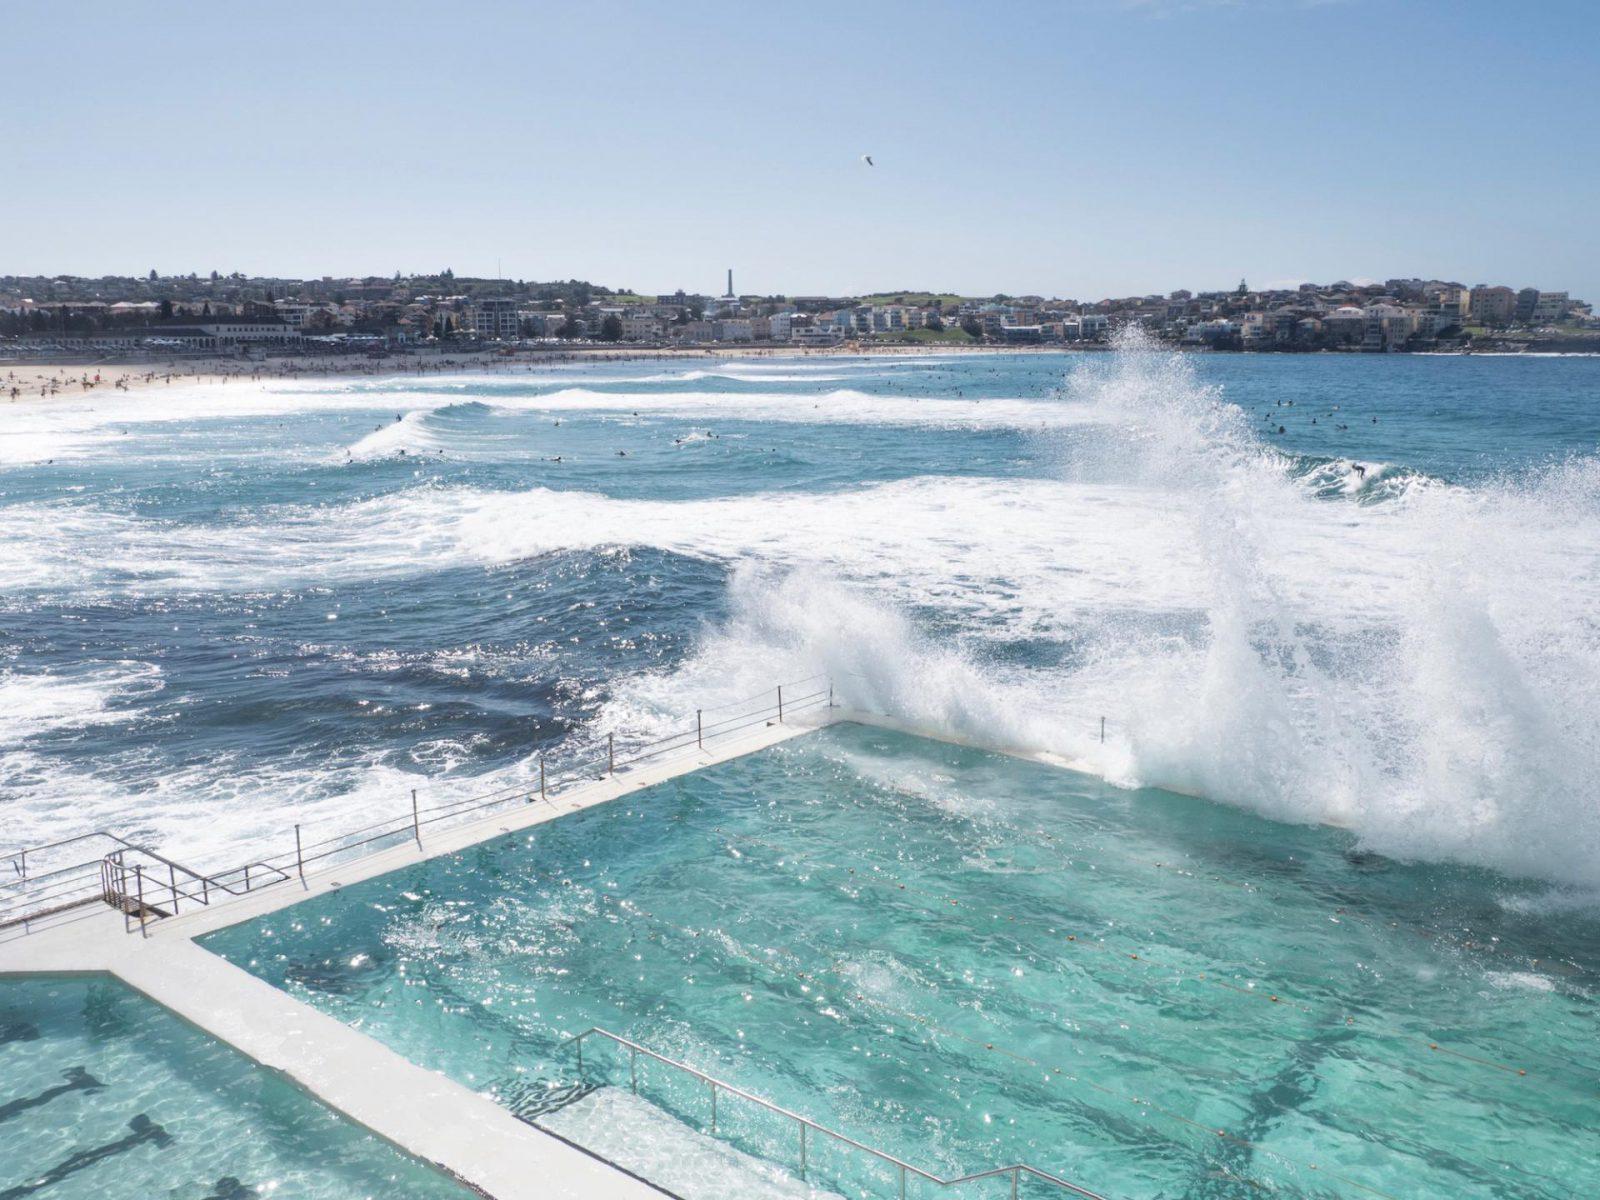 Sydney guide: Bondi Beach